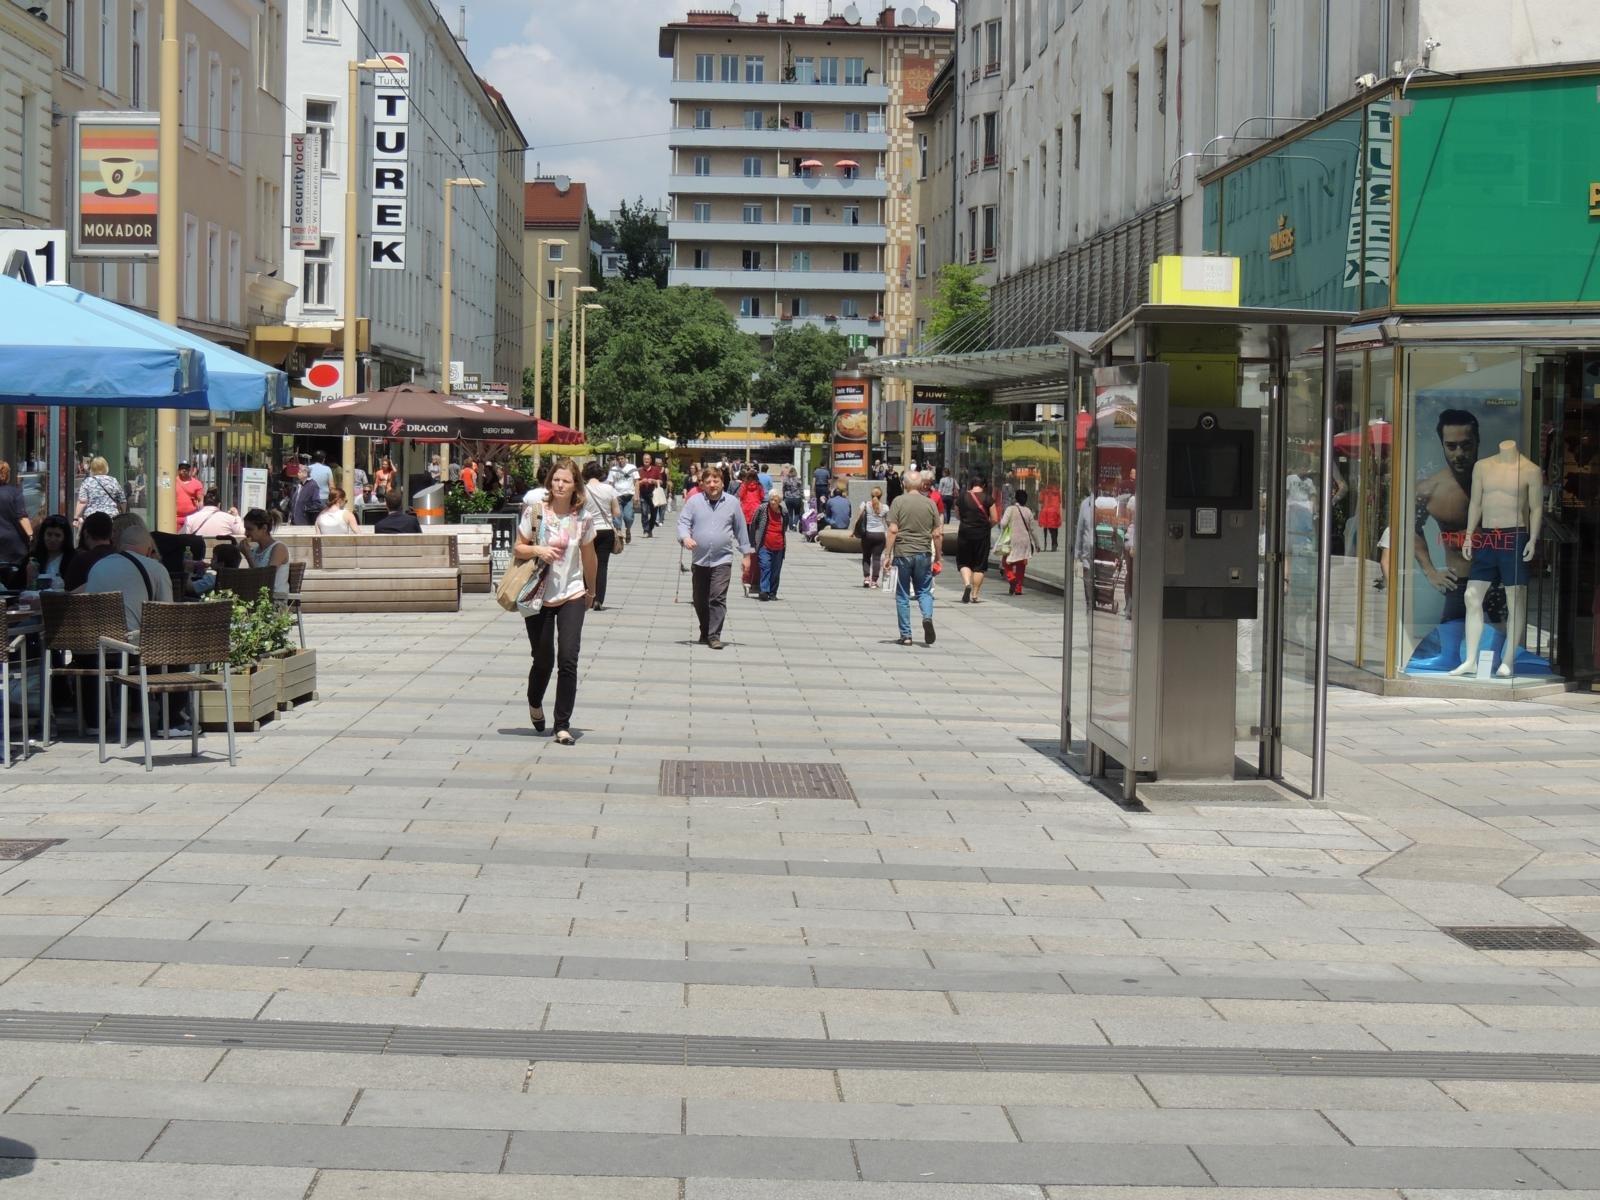 Wien - Meidlinger Hauptstraße7